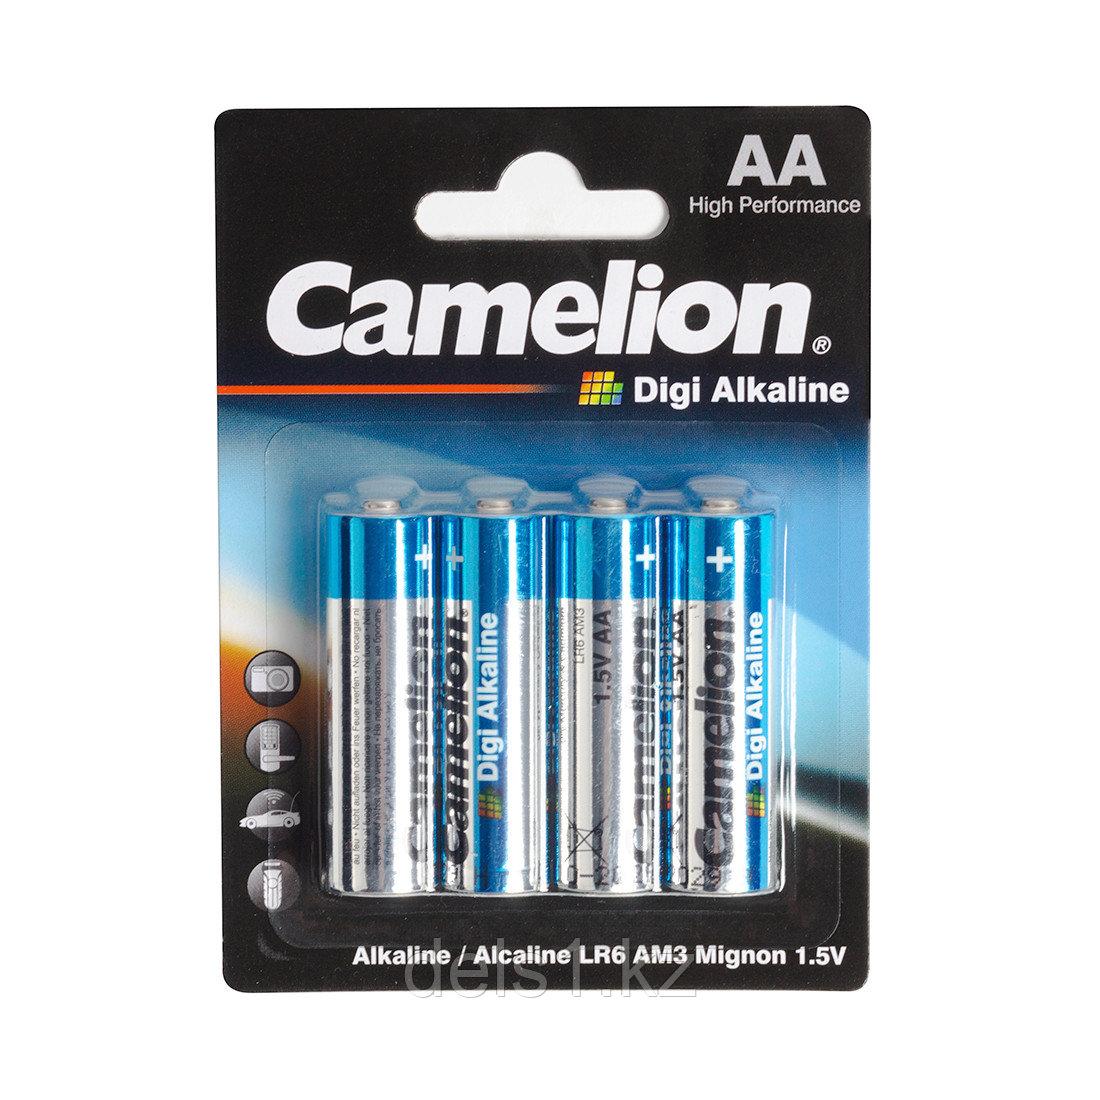 Батарейка, CAMELION, LR6-BP4DG, Digi Alkaline, AA, 1.5V, 2800mAh, 4 шт., в блистере